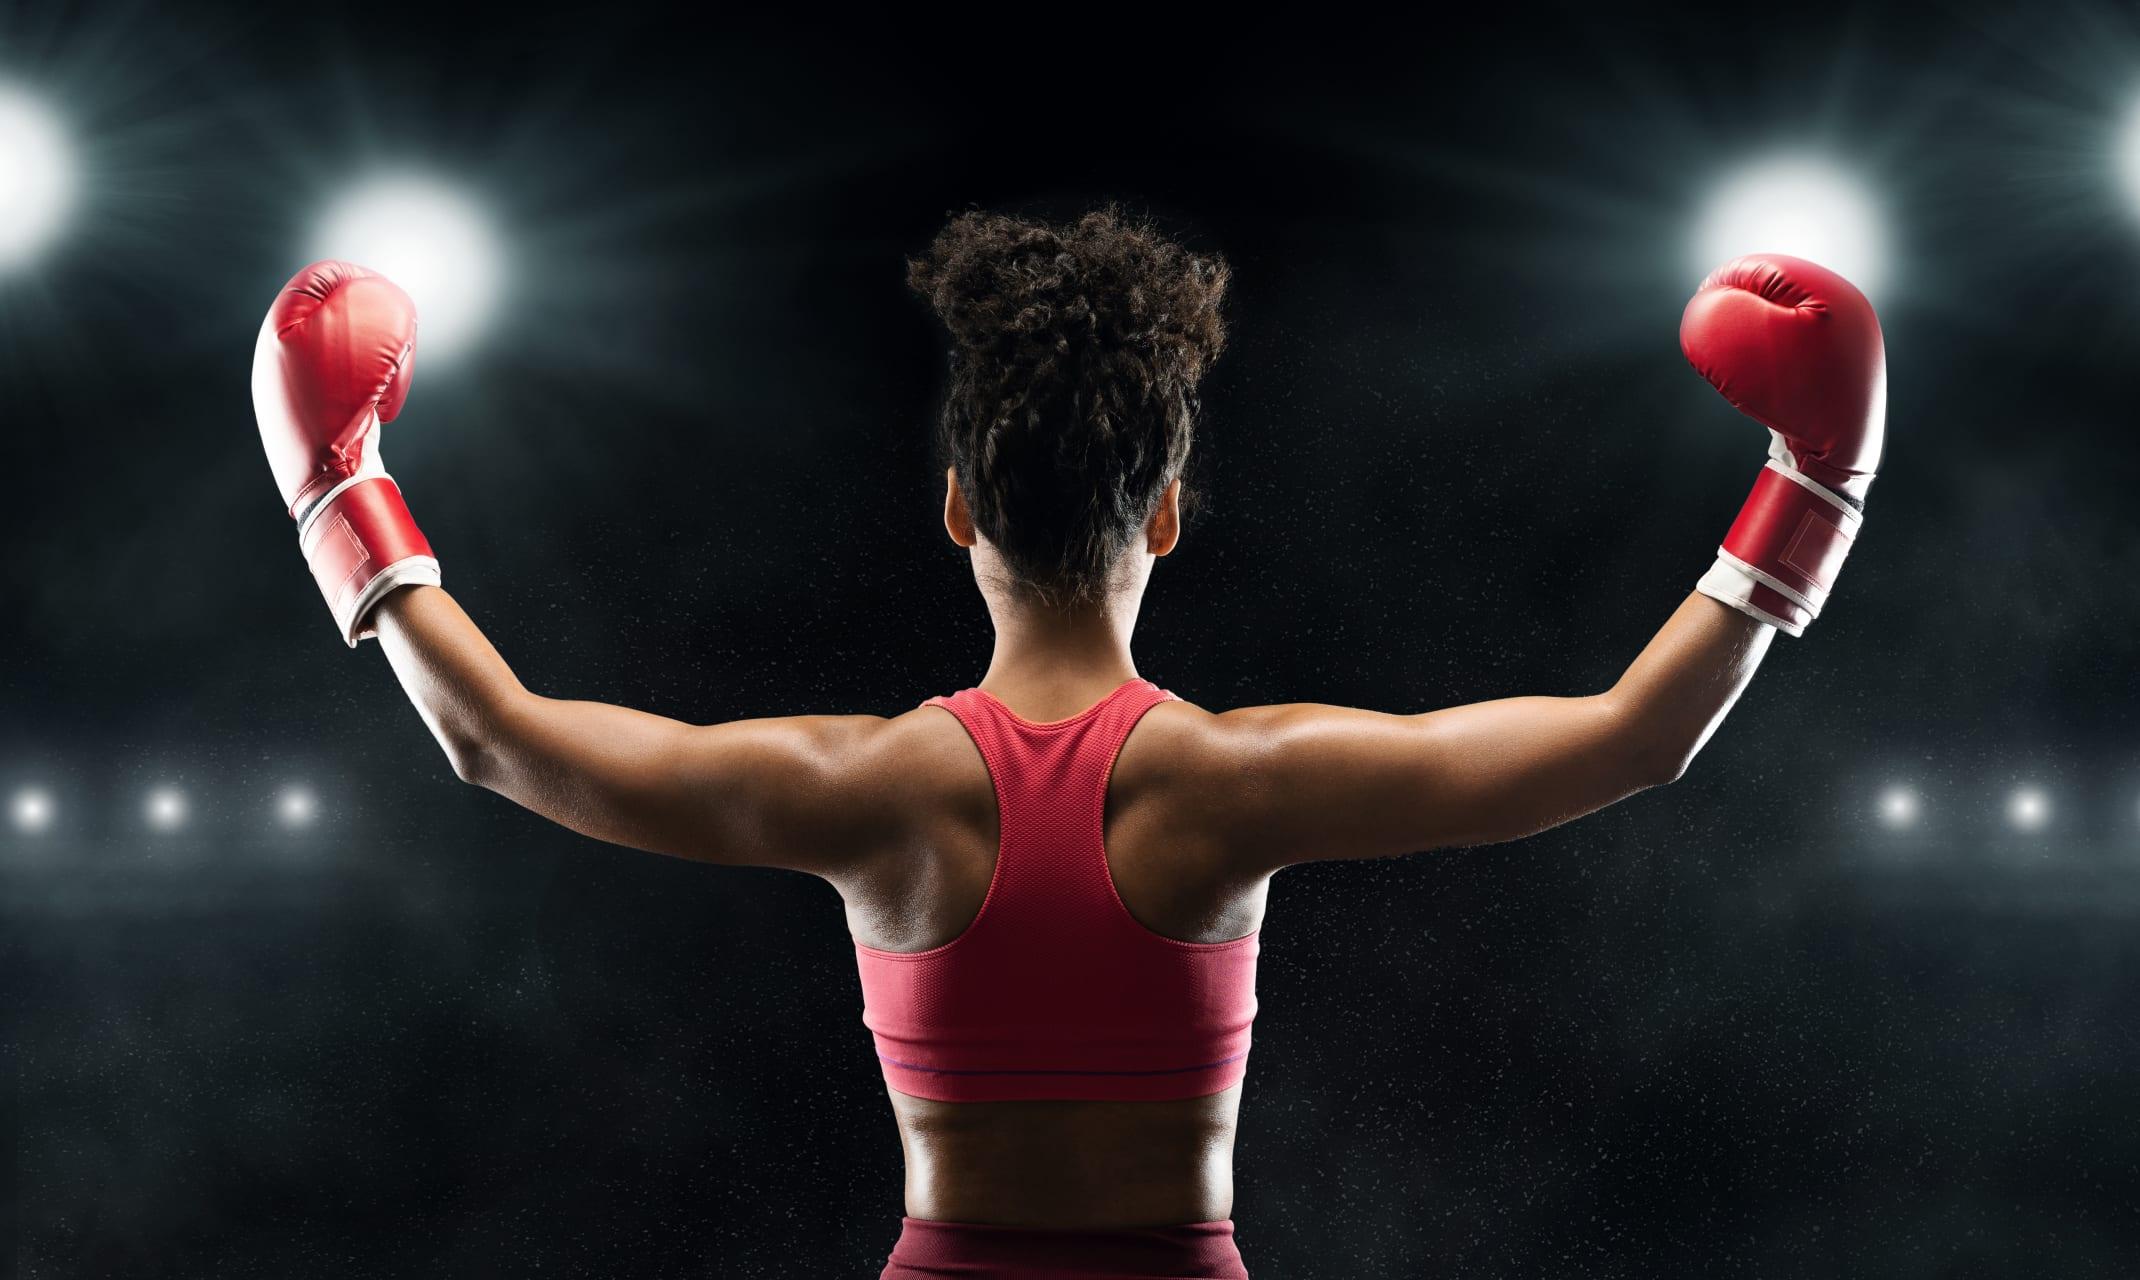 Accra - Women Boxing in Ghana (Jamestown)